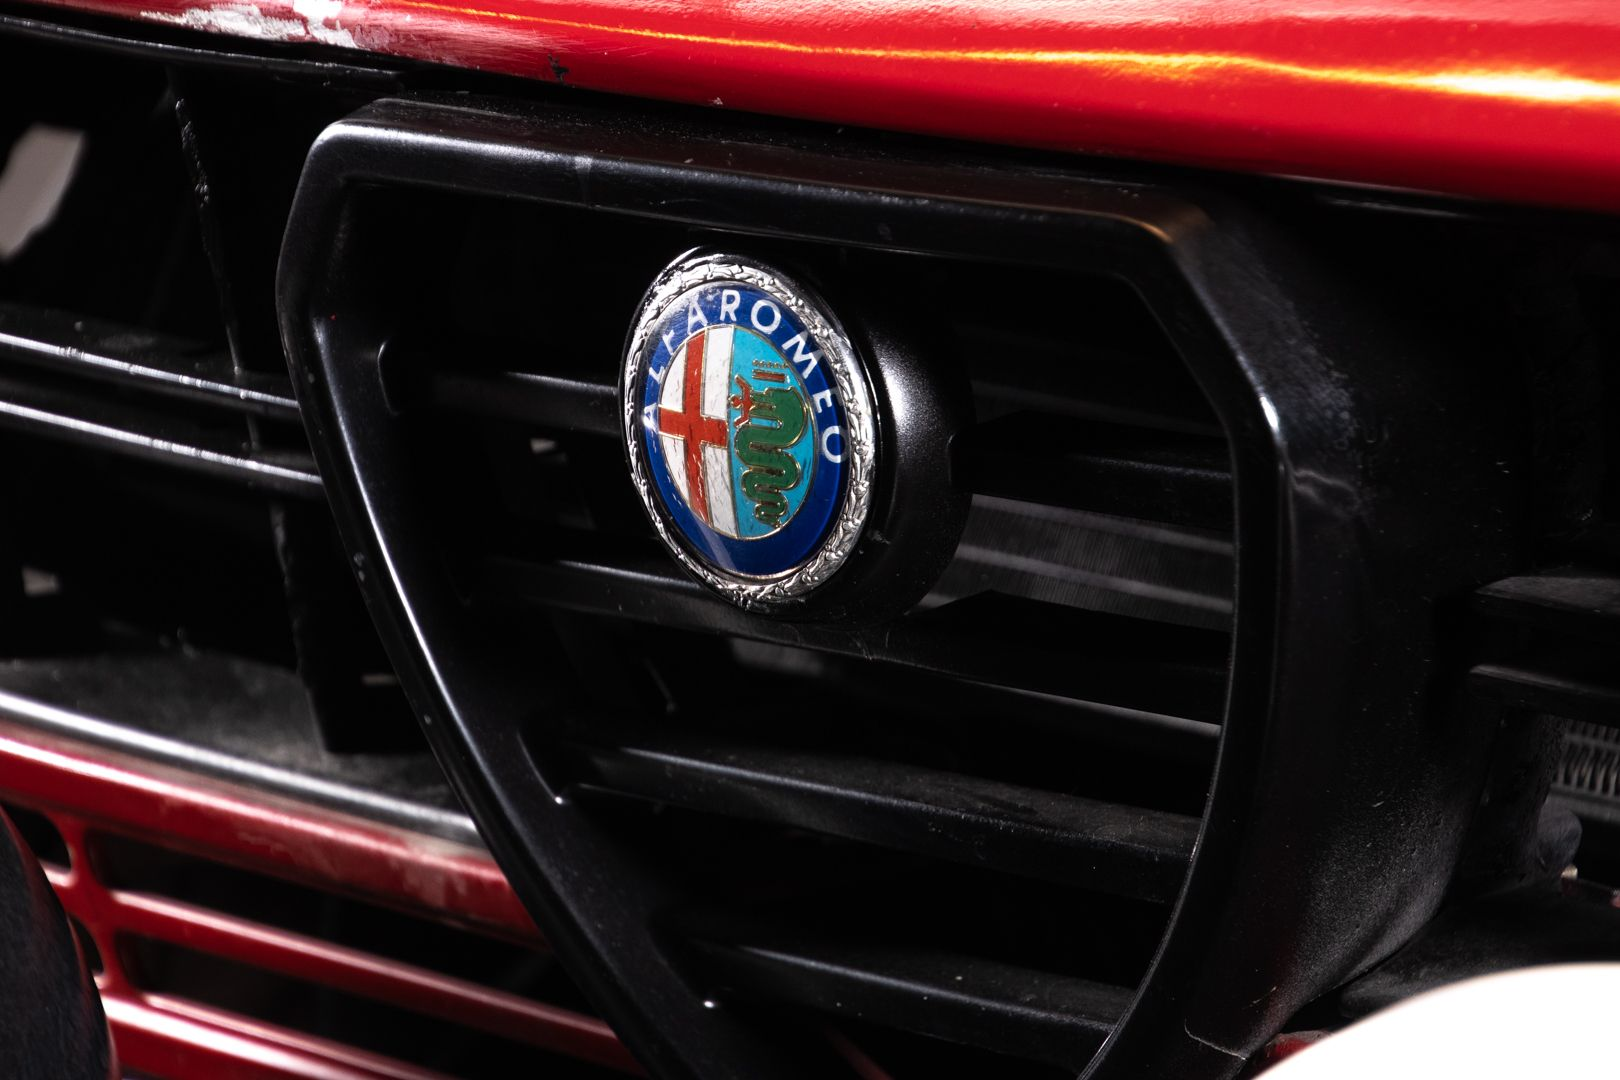 1979 Alfa Romeo Alfetta GTV Turbodelta Gr.4 48433